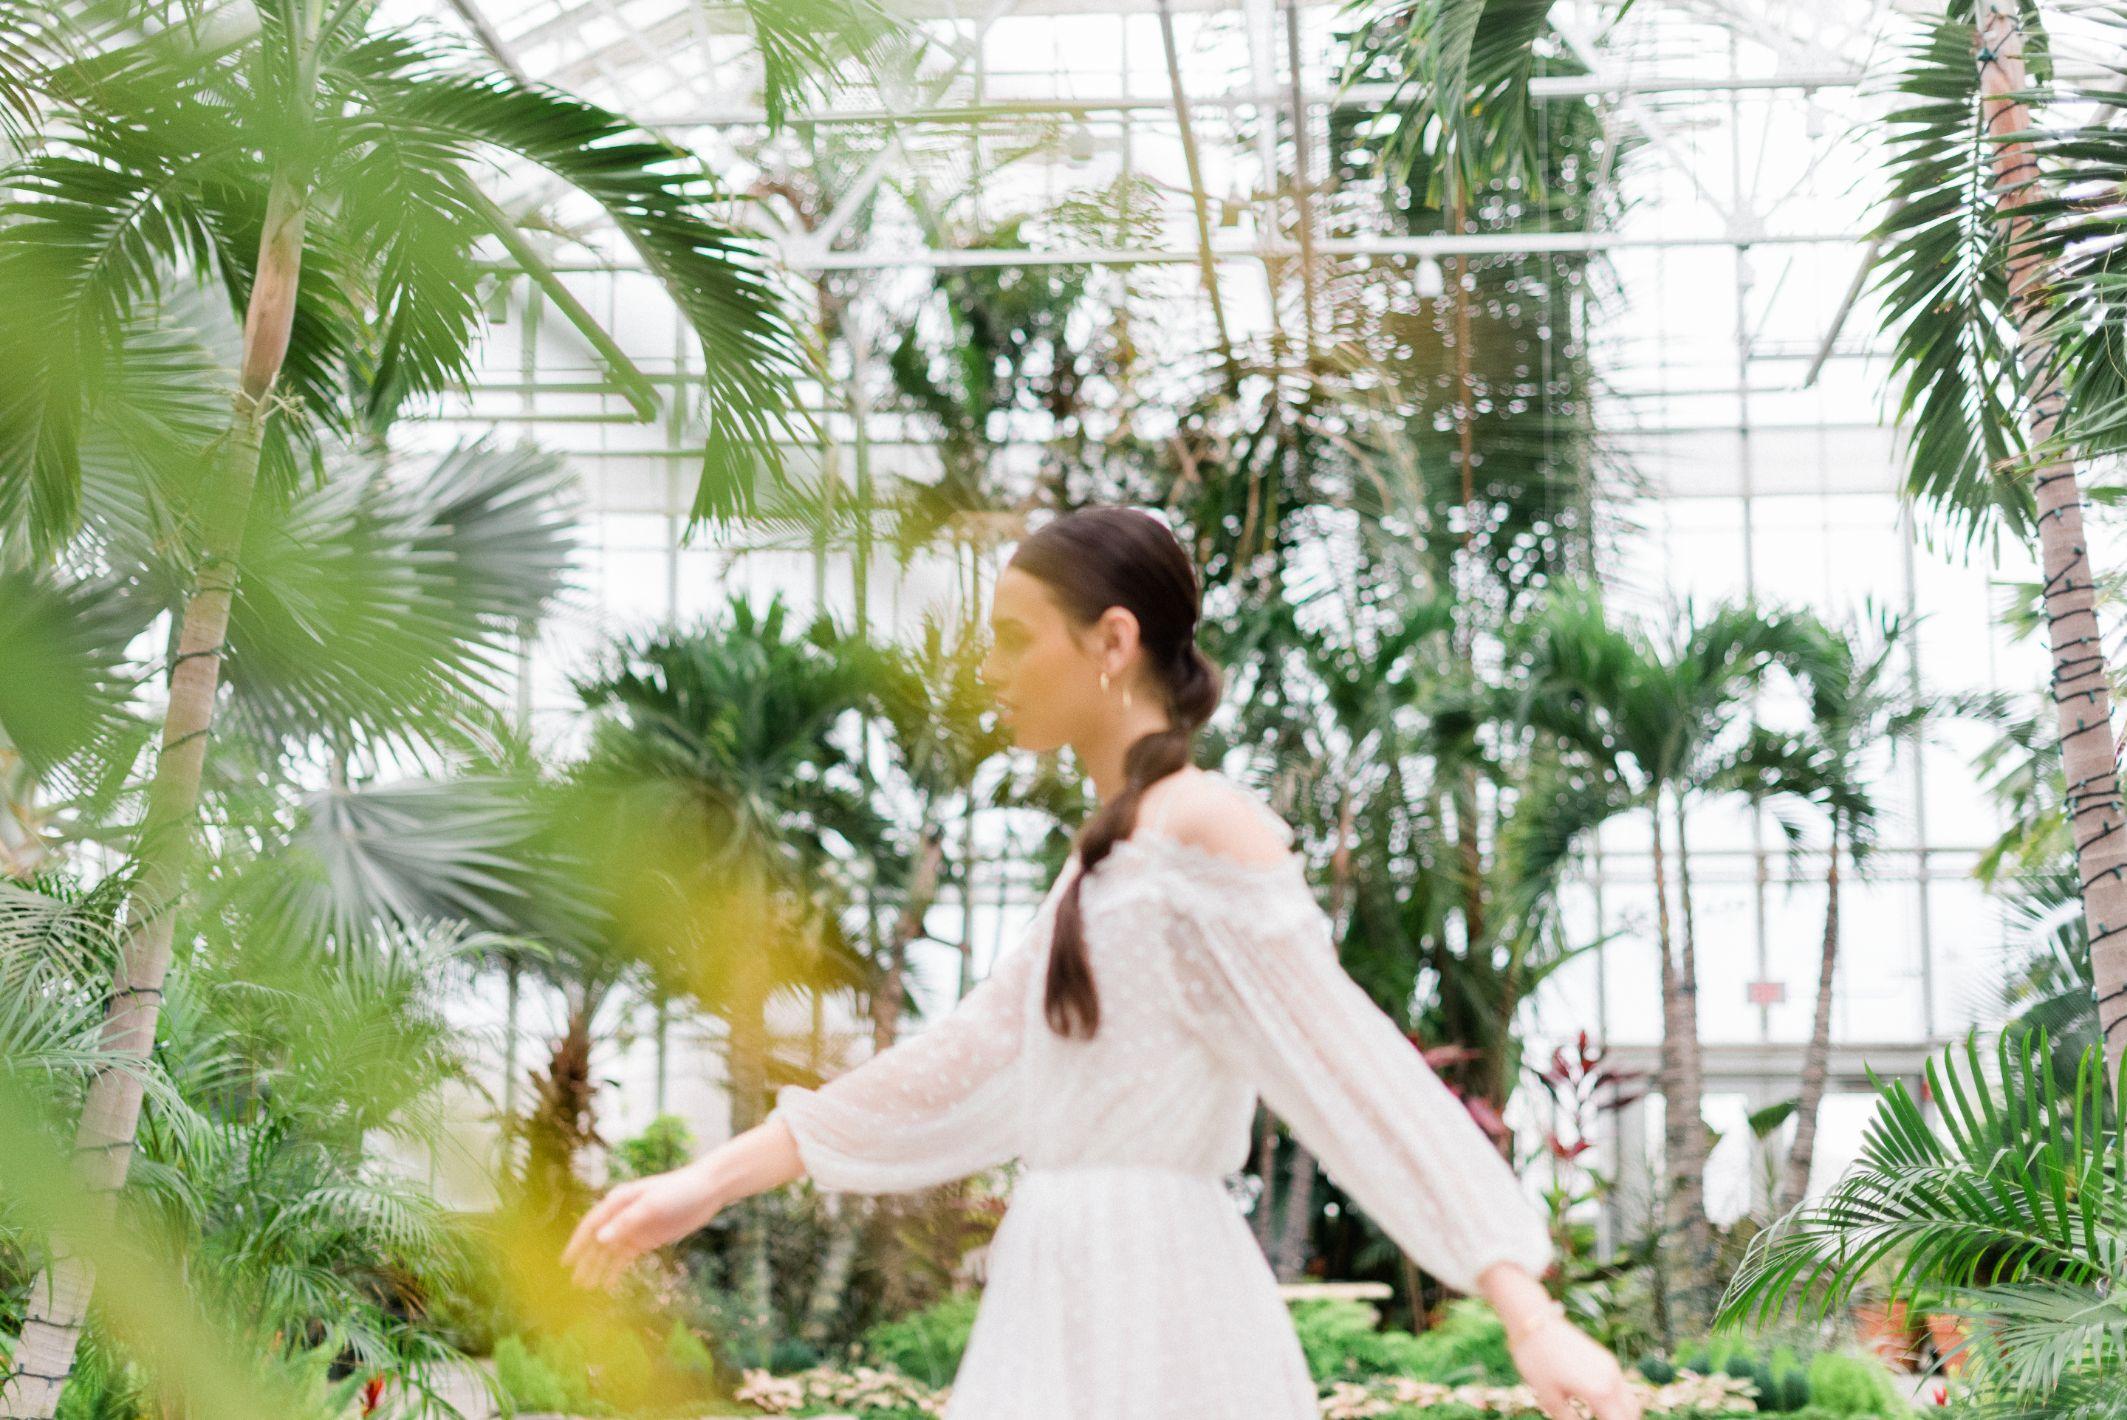 roger-williams-park-botanical-tropical-peach-daylynn-designs29.jpg